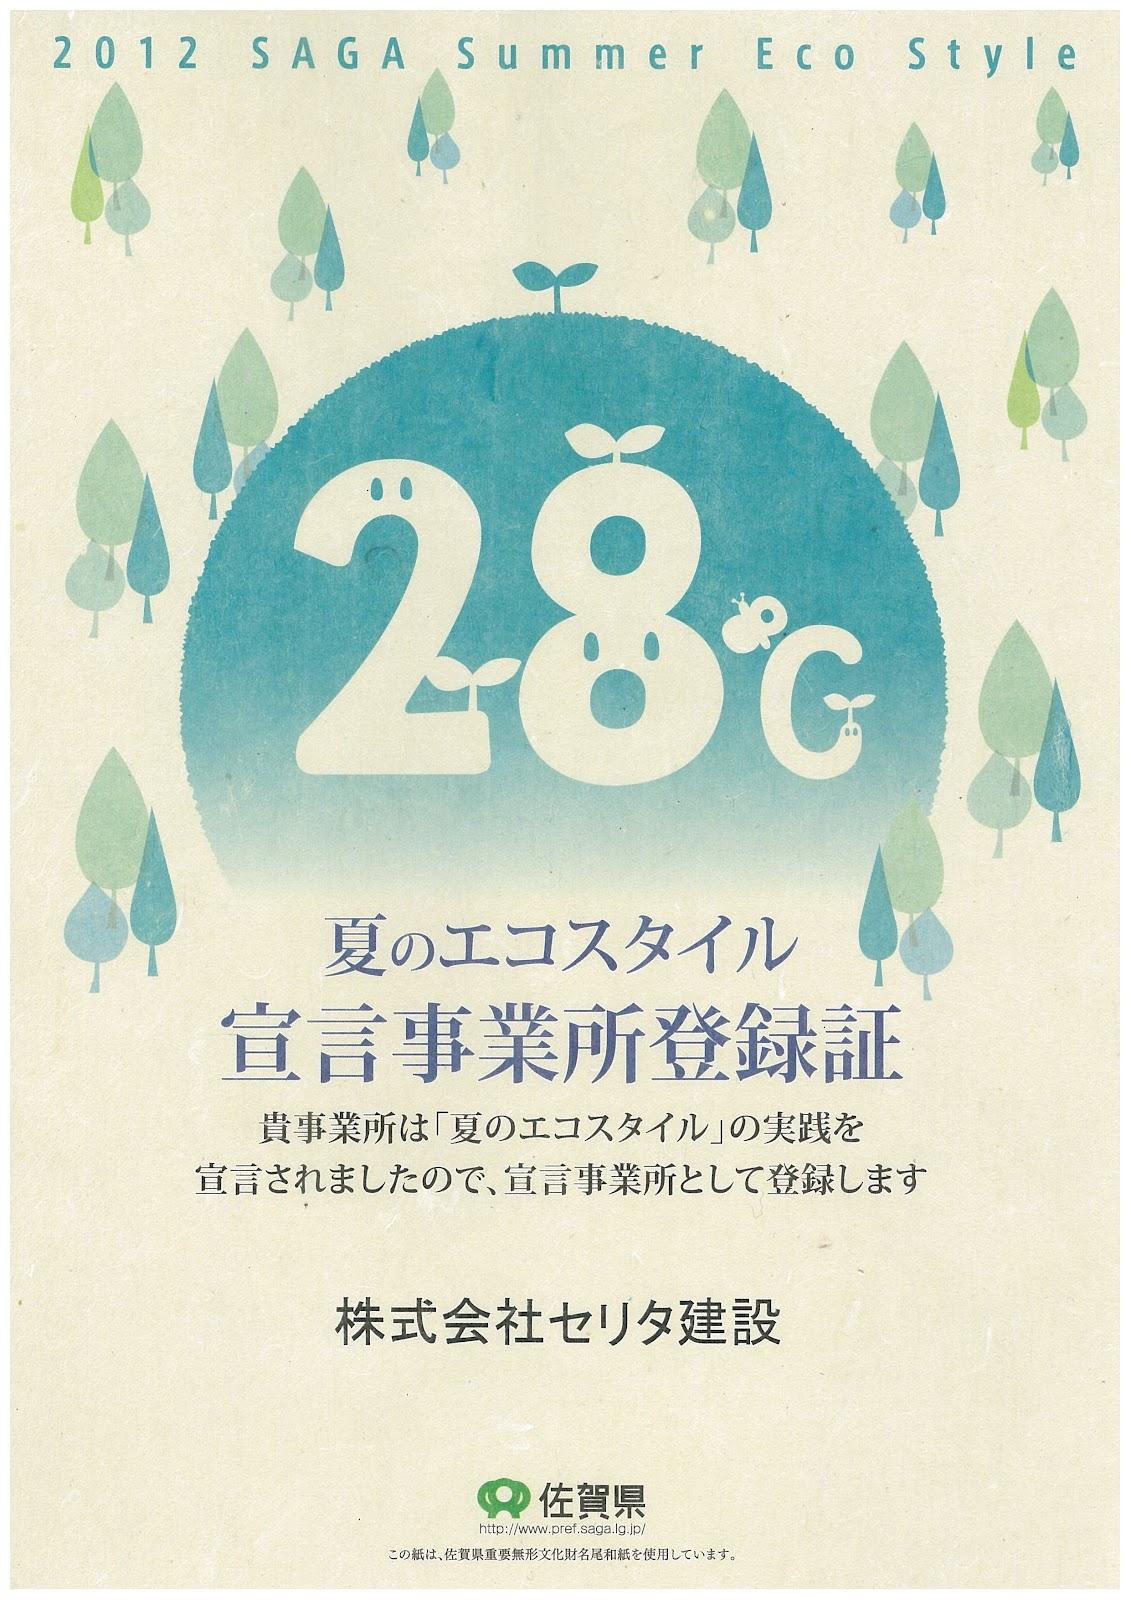 [CSR活動] 夏のエコスタイル宣言事業所